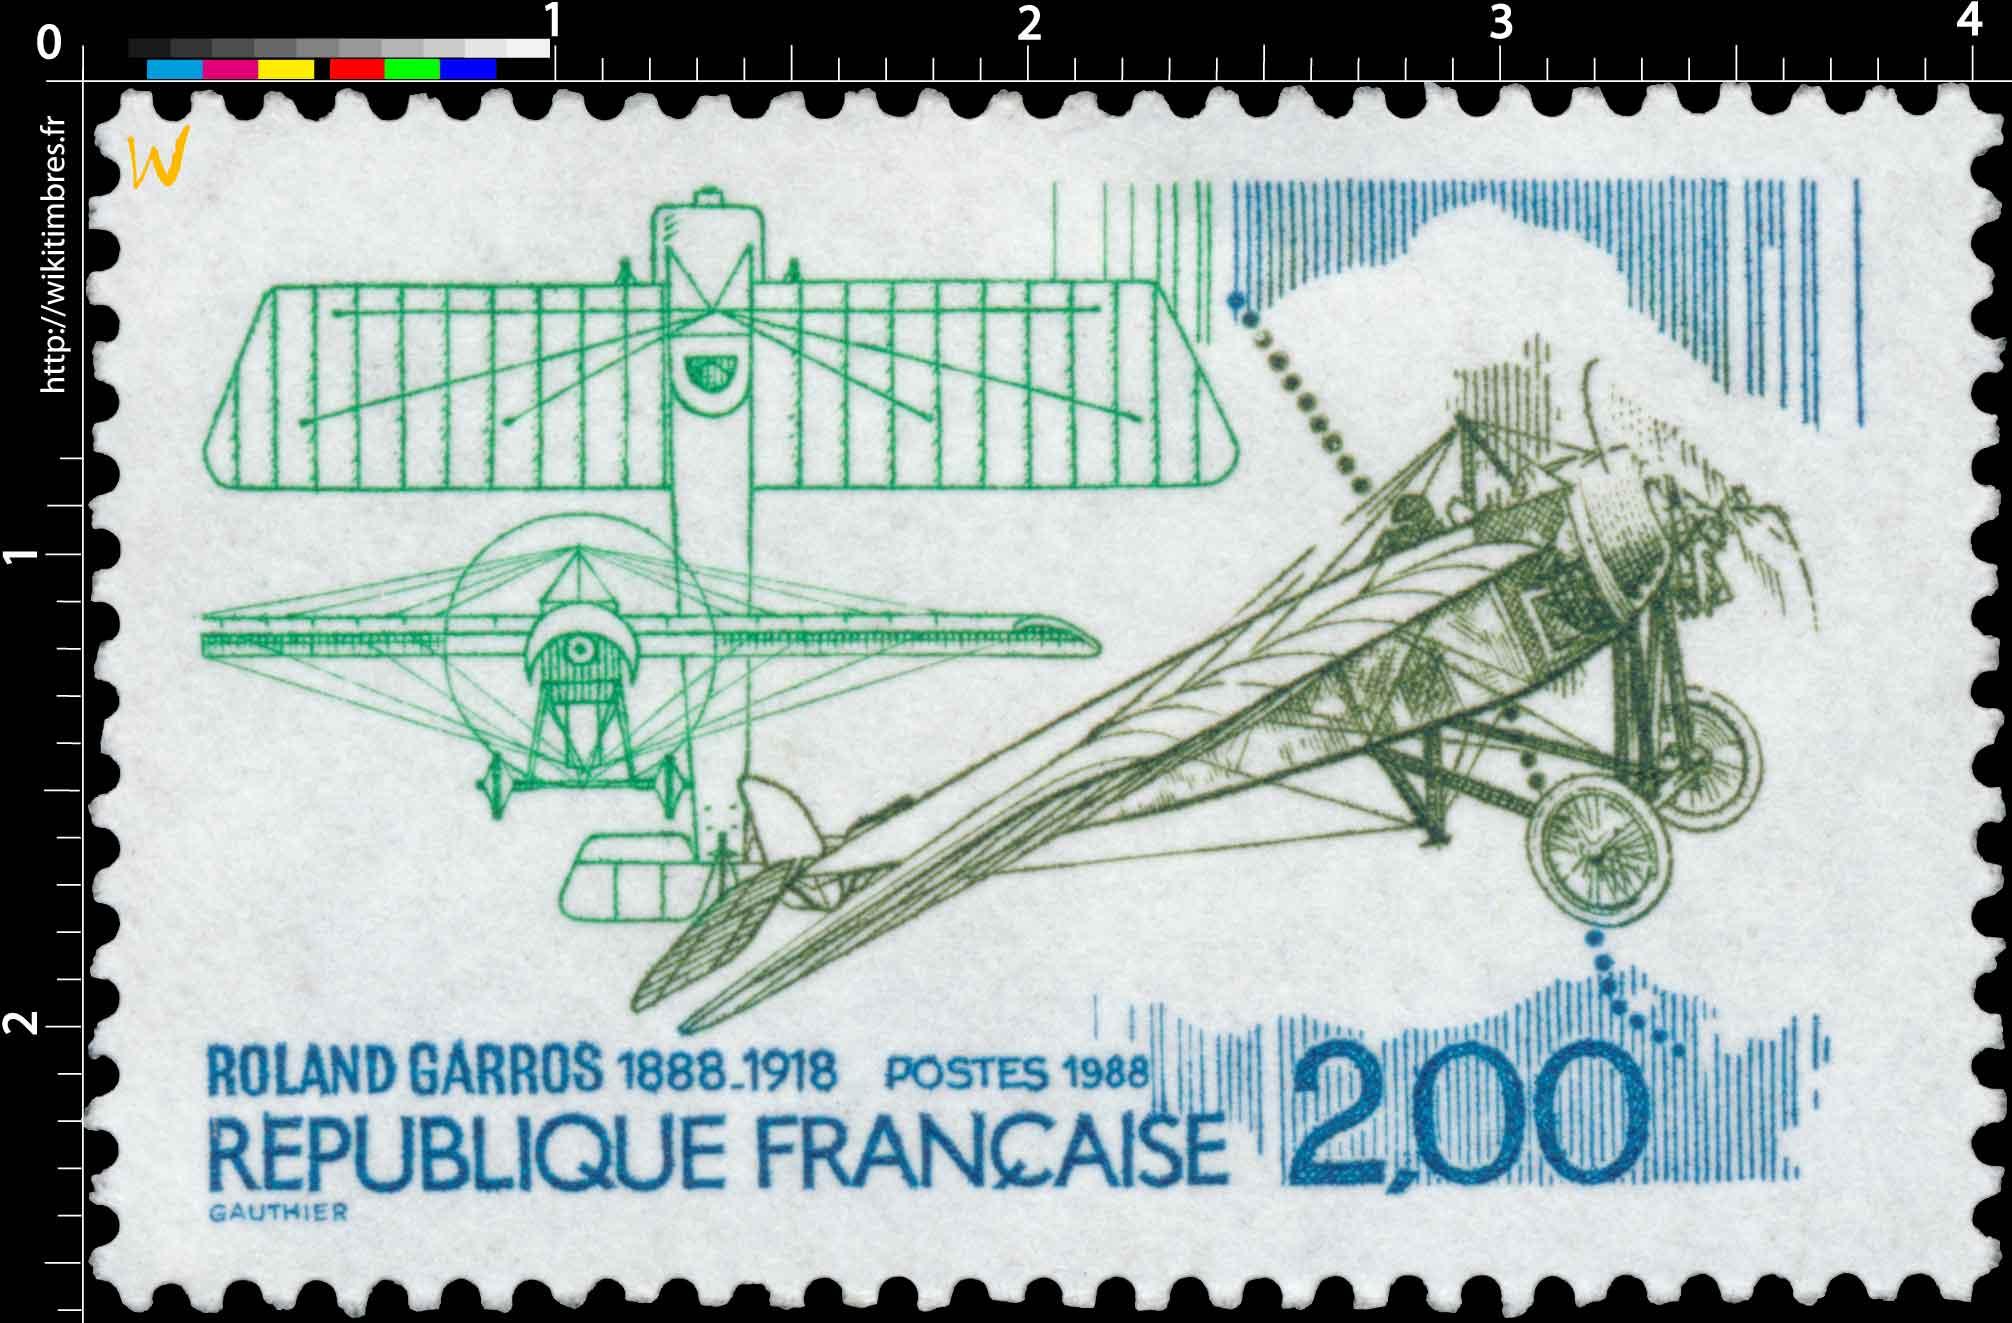 1988 ROLAND GARROS 1888-1918